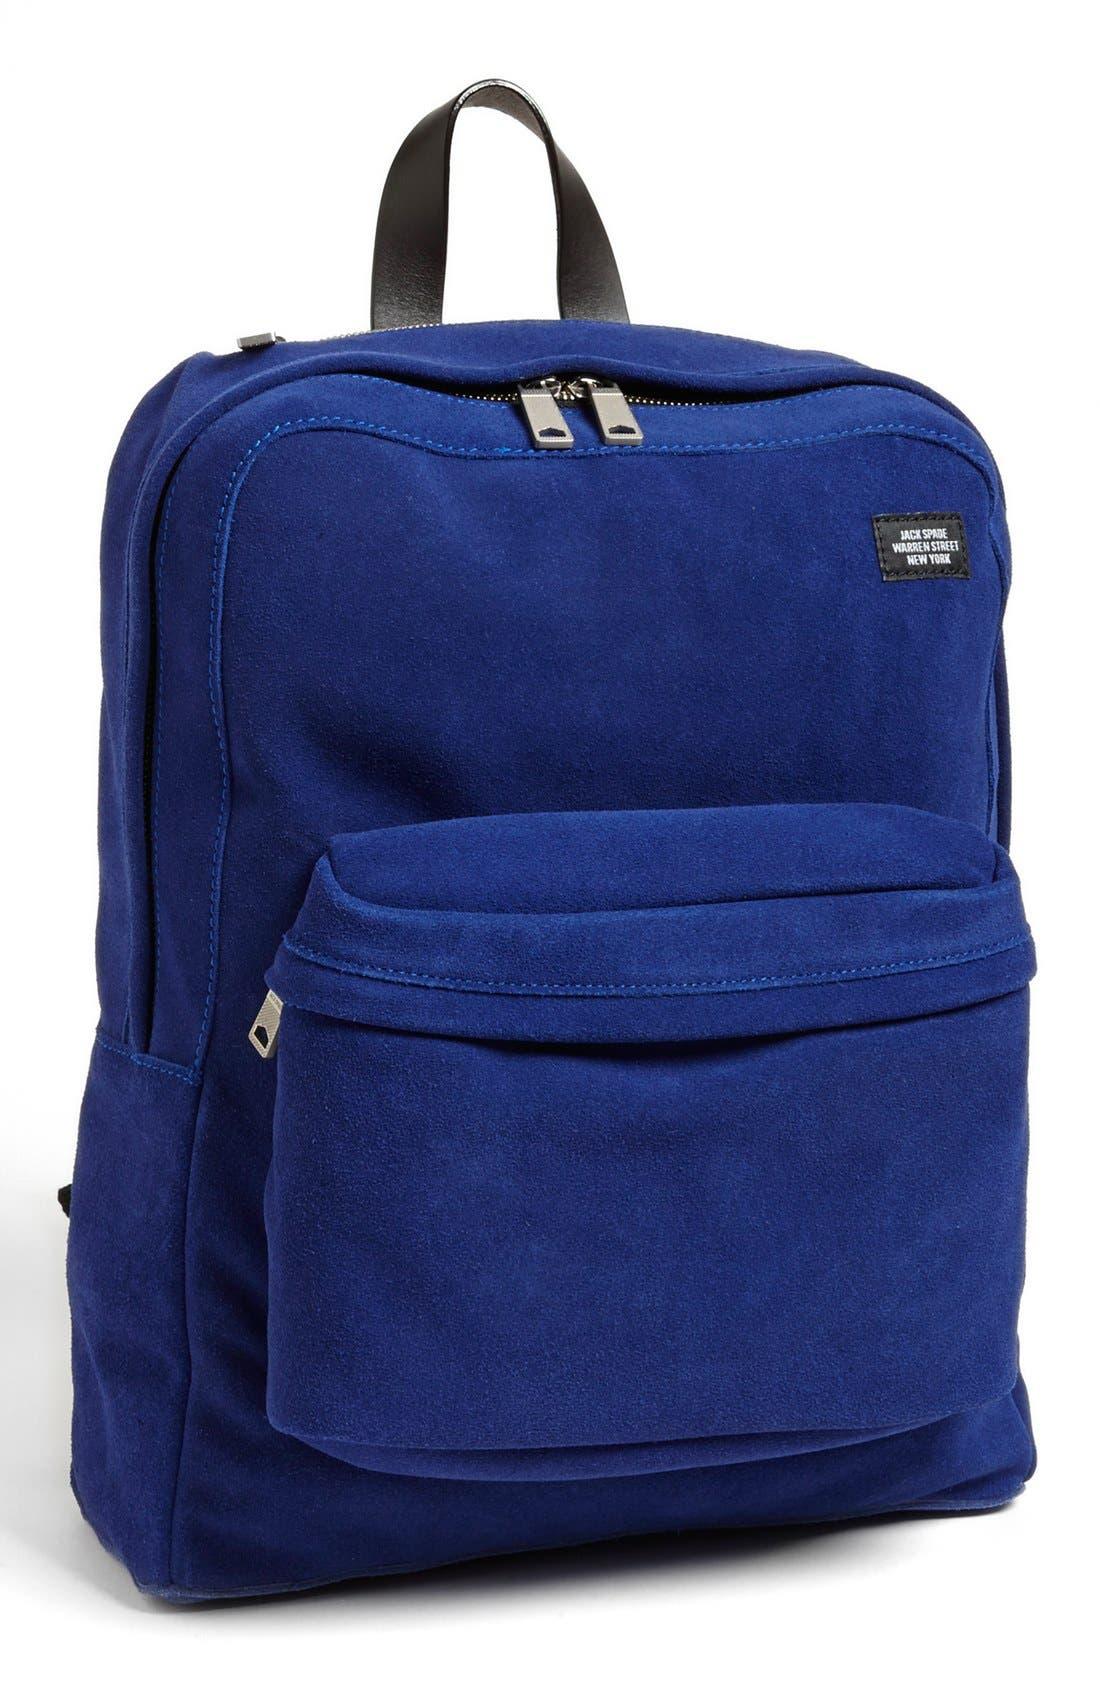 Main Image - Jack Spade 'Desert' Backpack